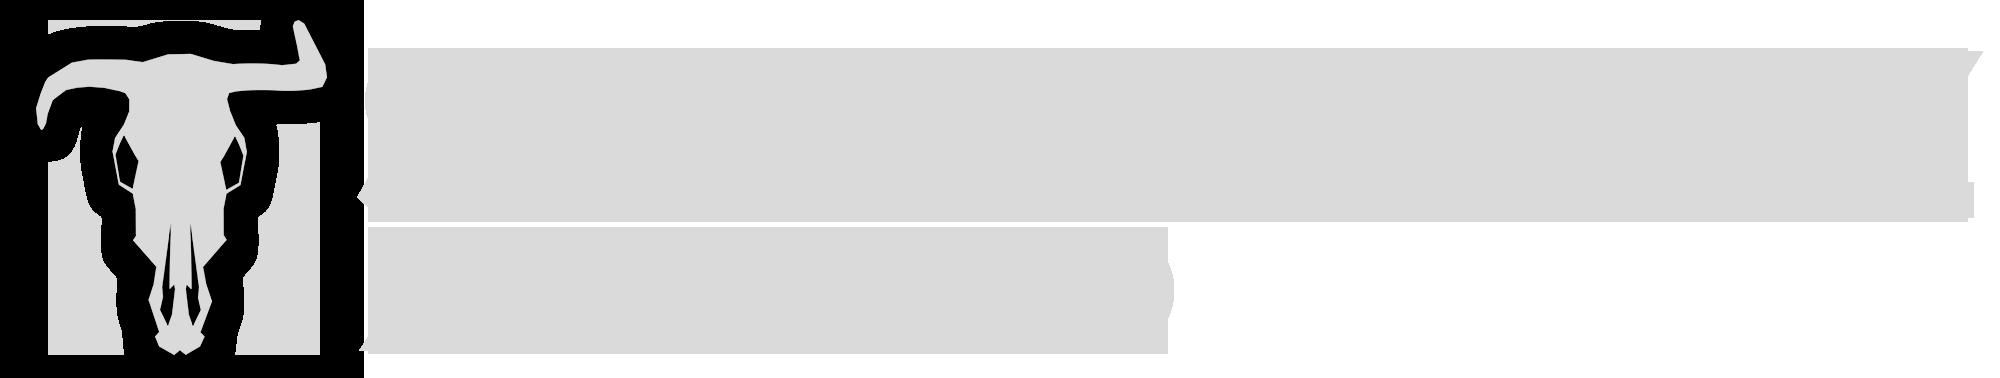 SAUL MENENDEZ | zoollpho - Photographer, videographer and graphic designer